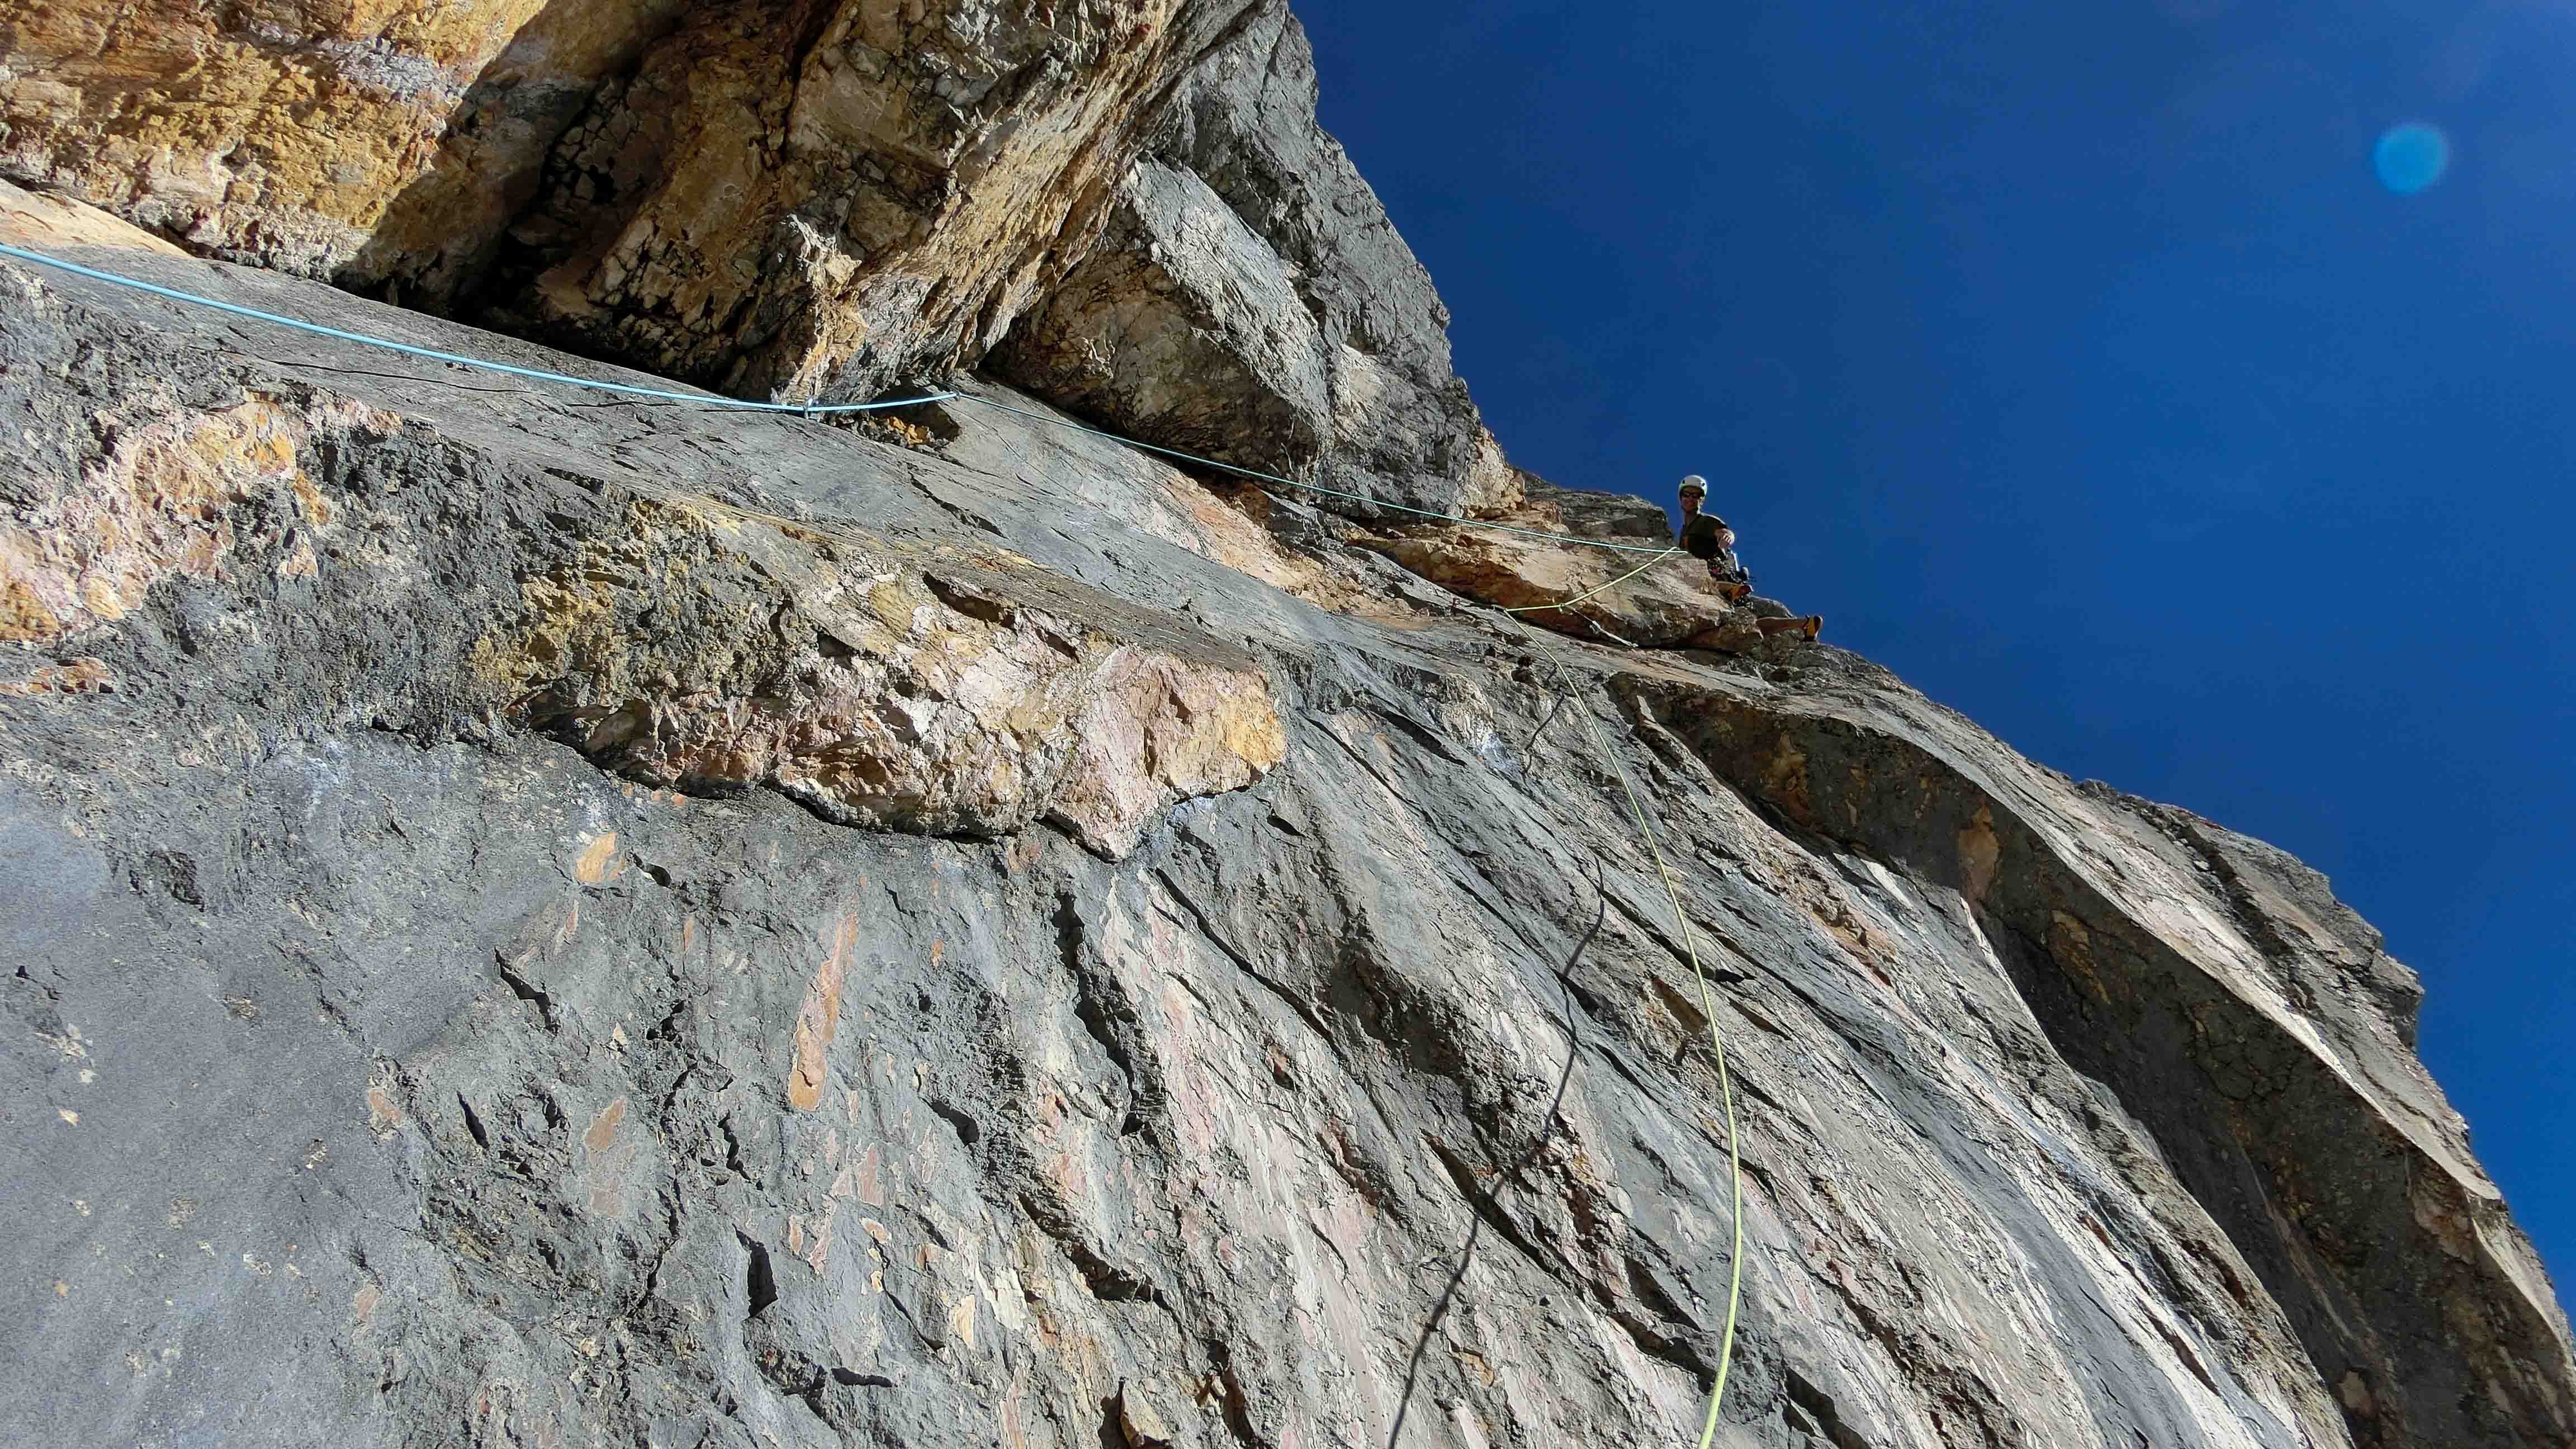 Locker vom Hocker, Klettern